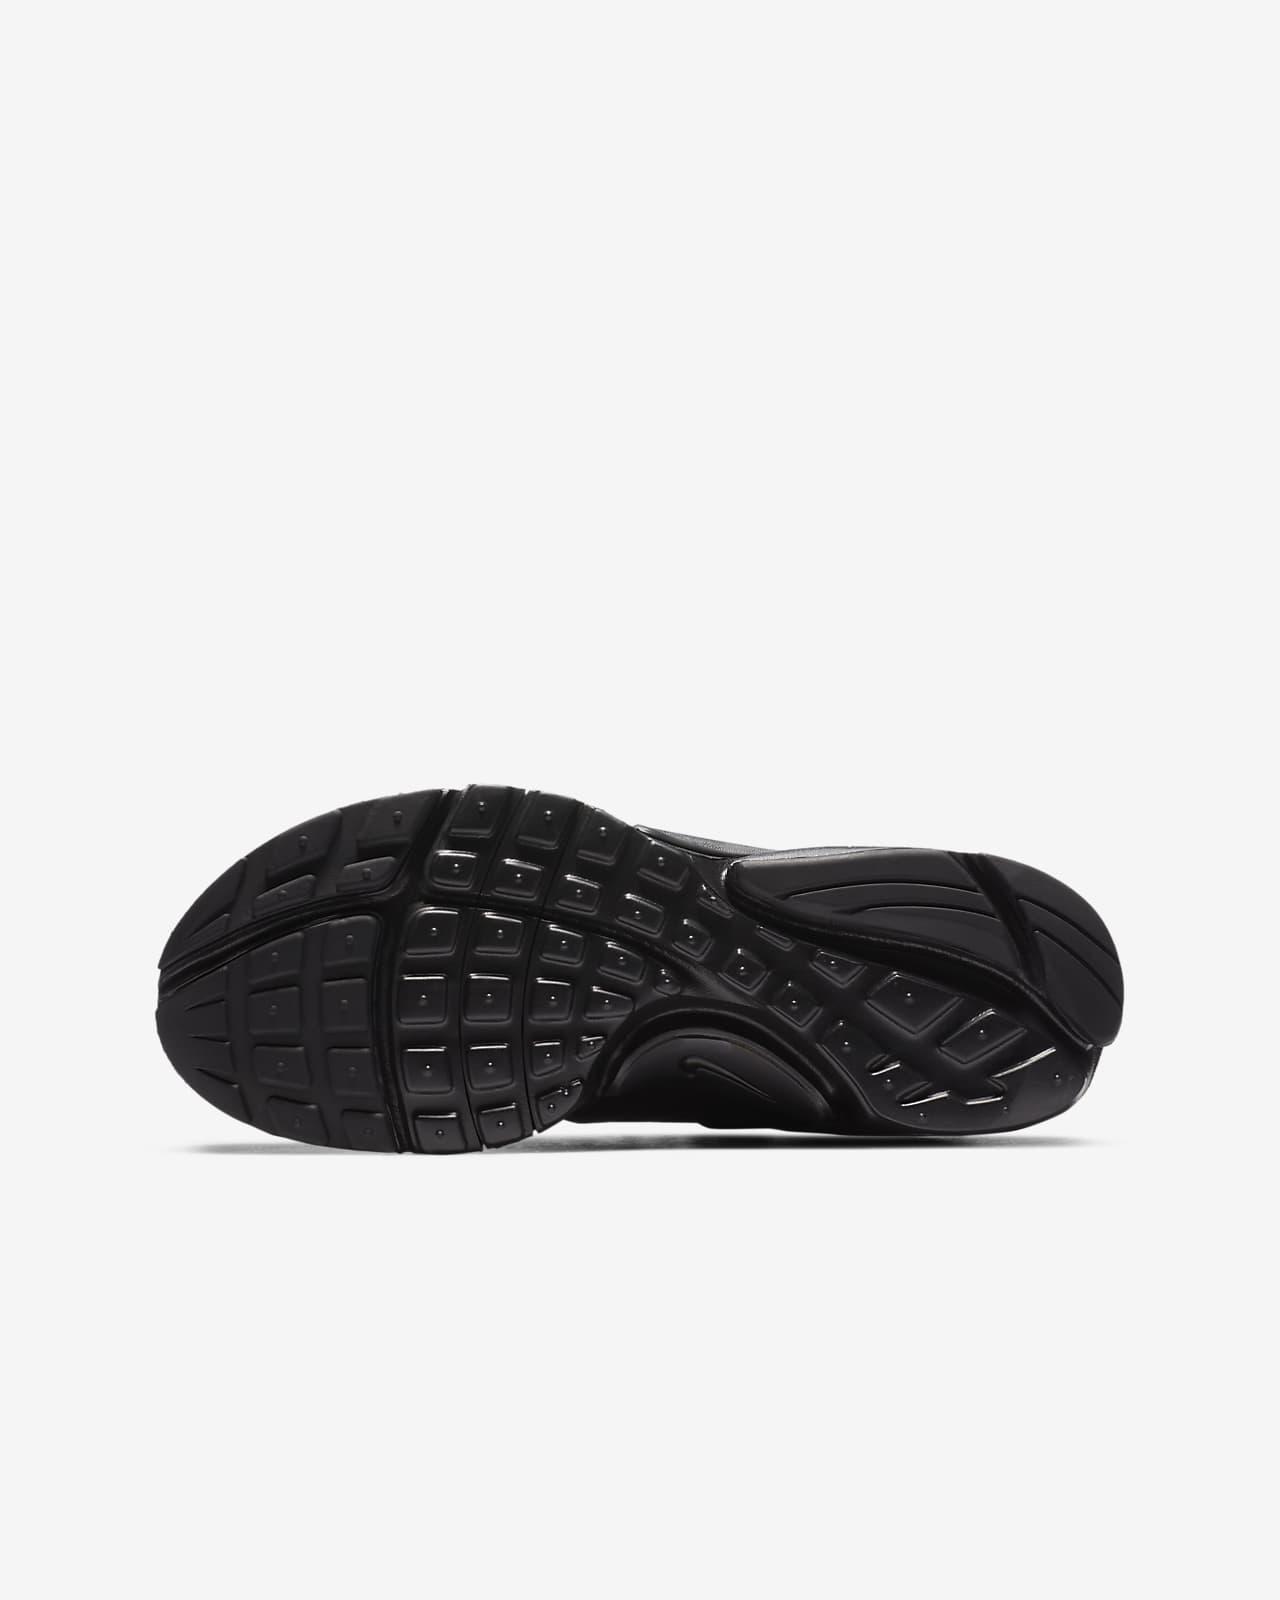 Chaussure Nike Presto pour Enfant plus âgé. Nike LU